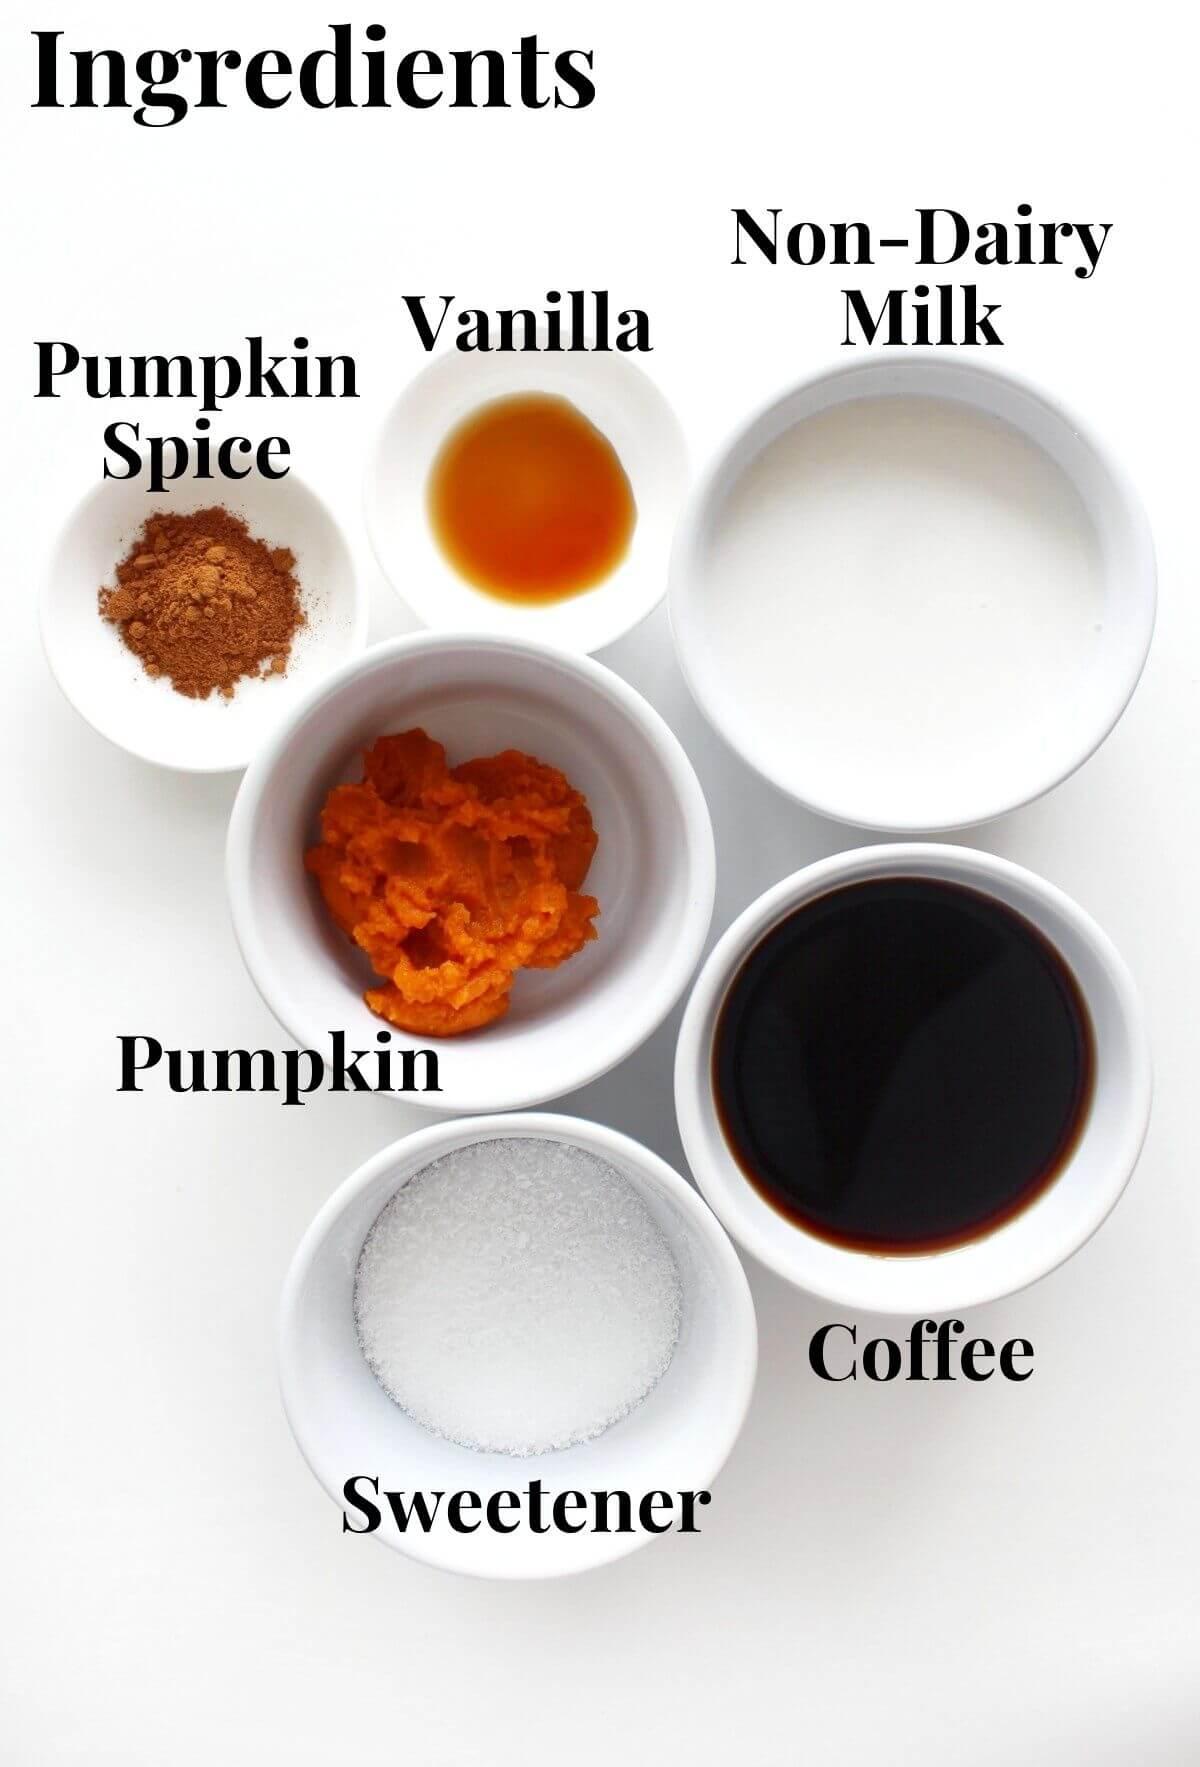 ingredients for vegan pumpkin spice latte